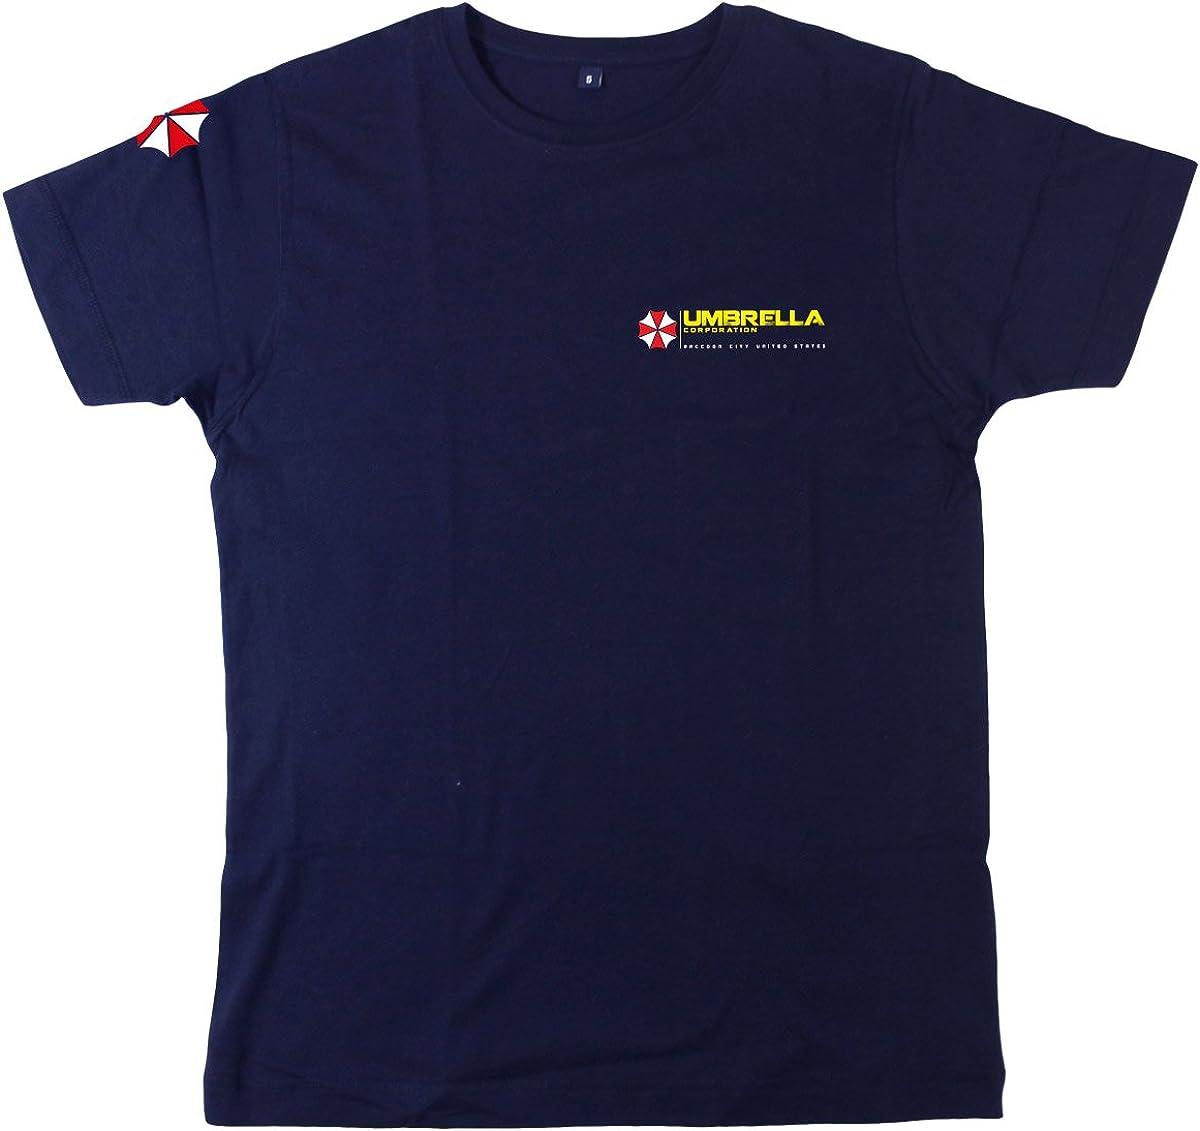 Arcane Store - Camiseta - Manga Corta - para Hombre Azul Azul Marino Small: Amazon.es: Ropa y accesorios